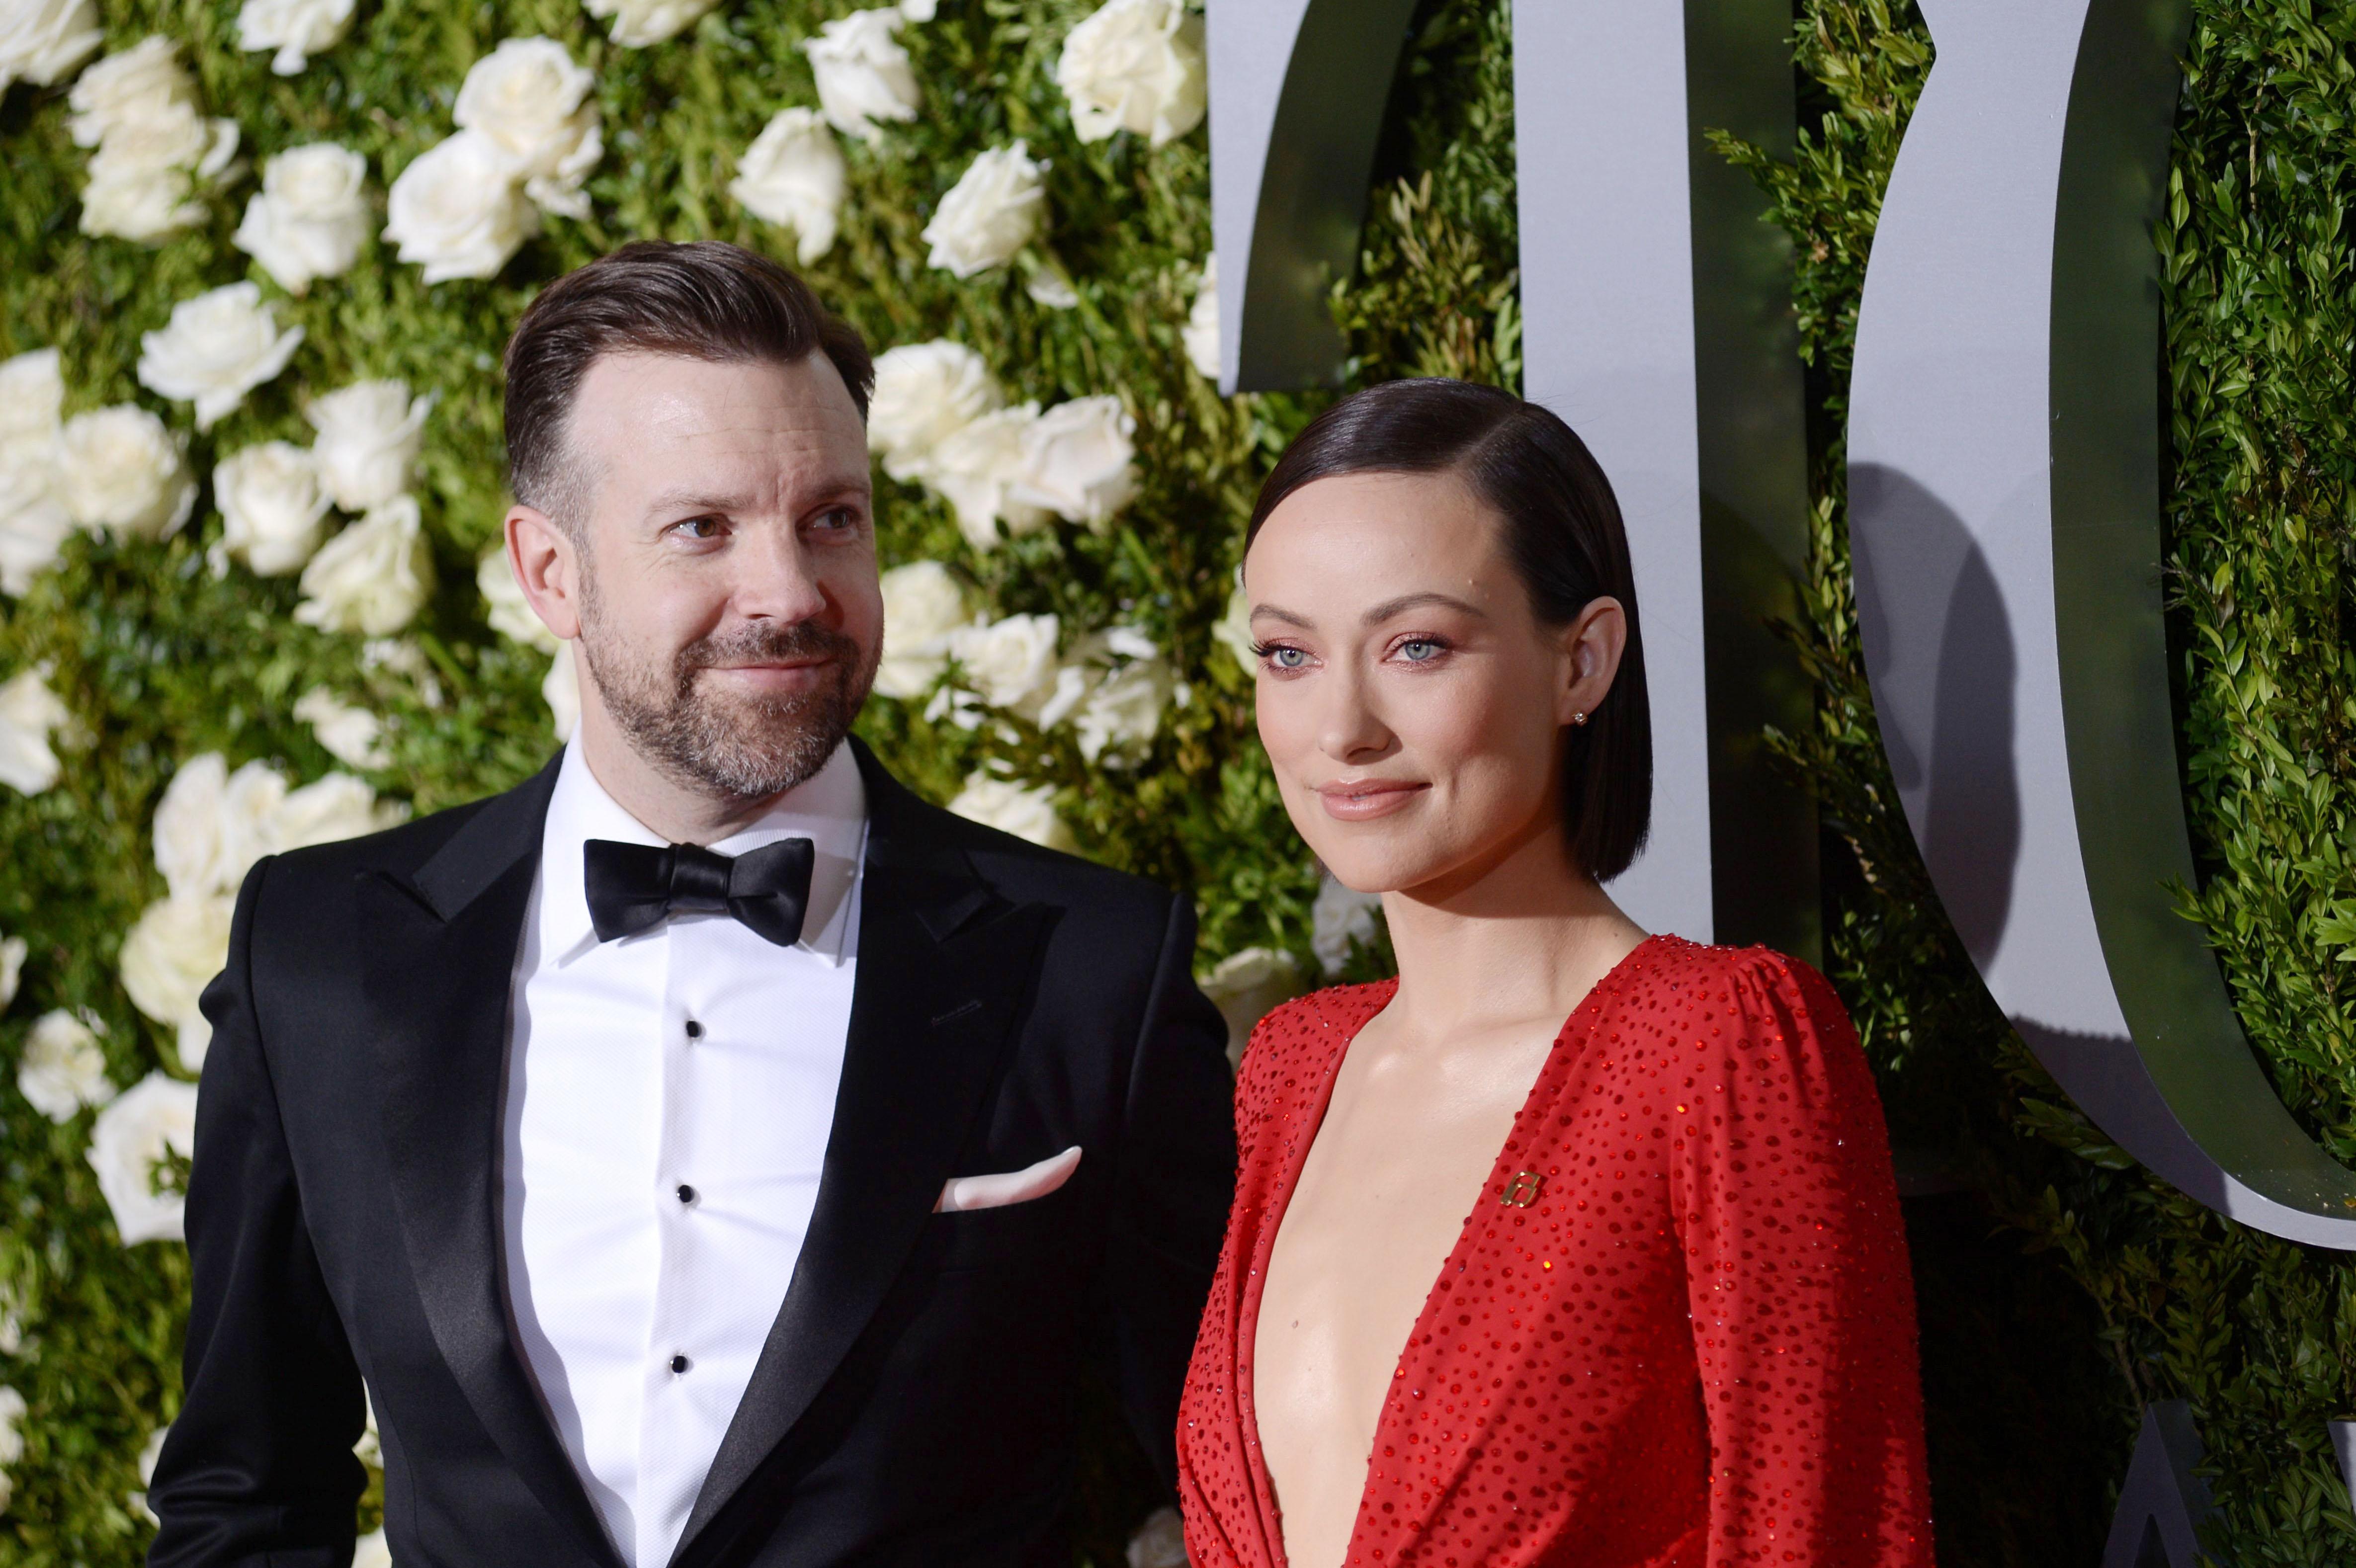 Jason Sudeikis and Olivia Wilde71st Annual Tony Awards, Arrivals, New York, USA - 11 Jun 2017